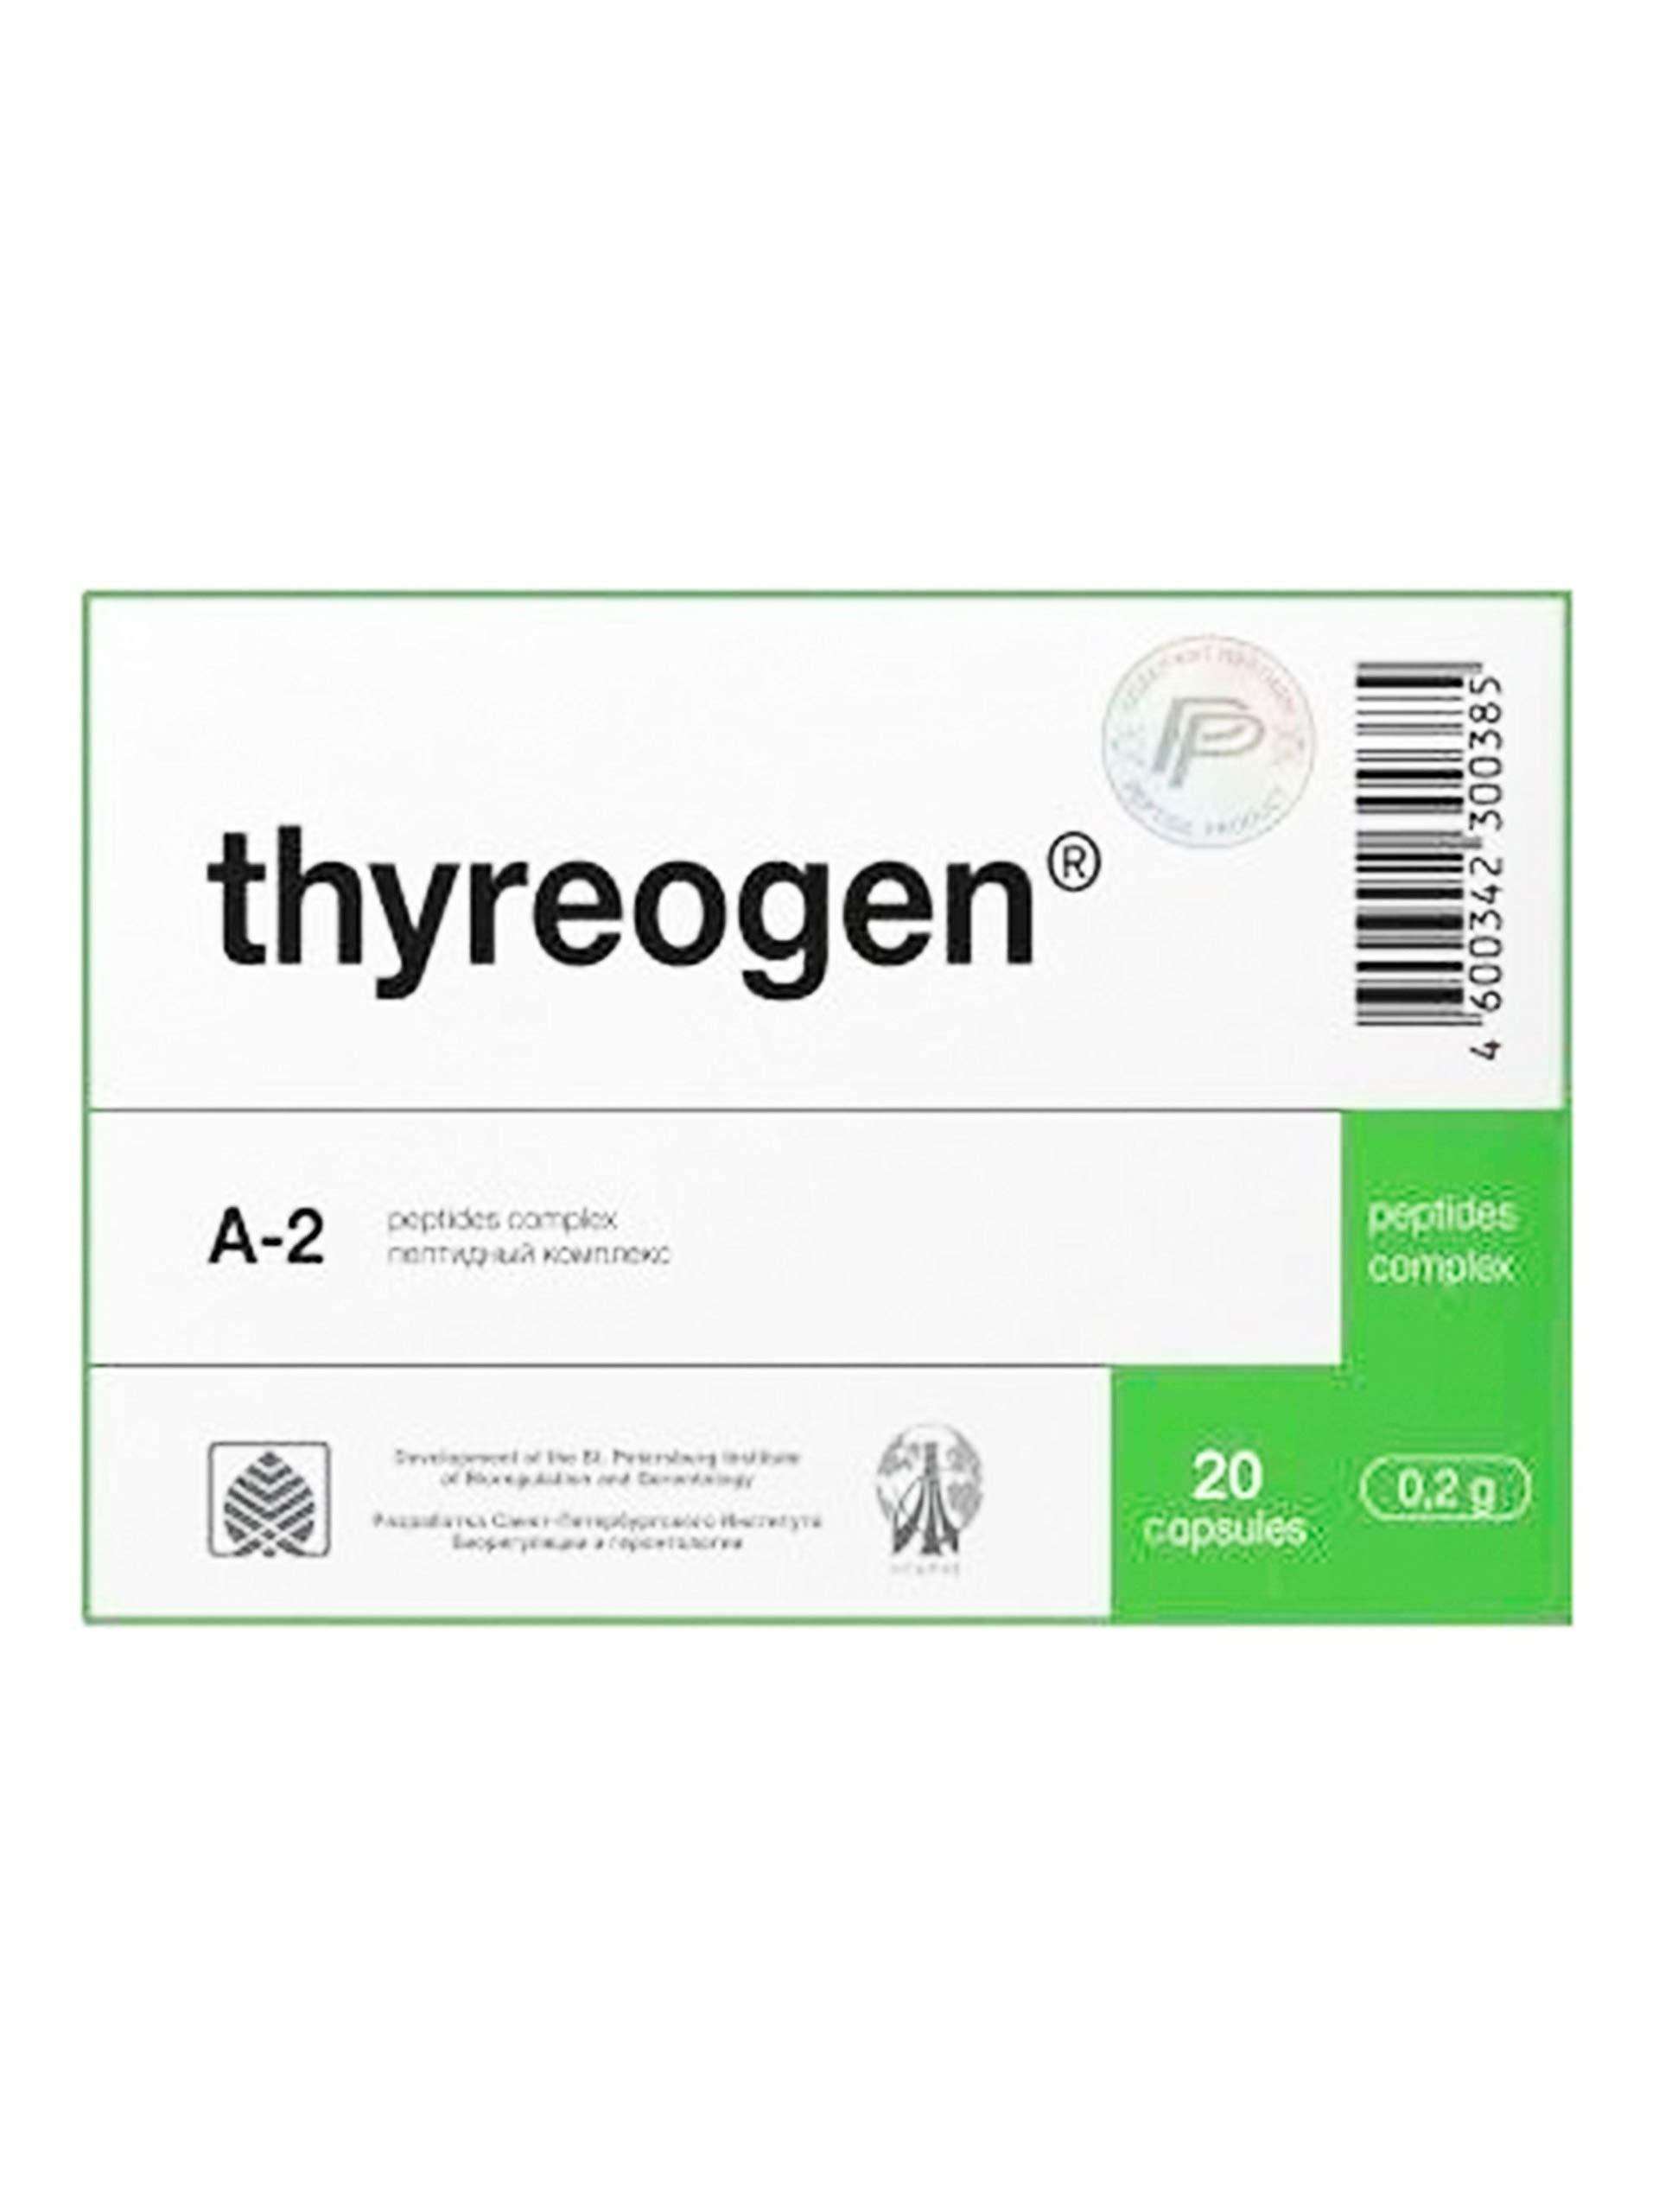 A-2 THYREOGEN - Thyroid PEPTIDE 20 Capsules